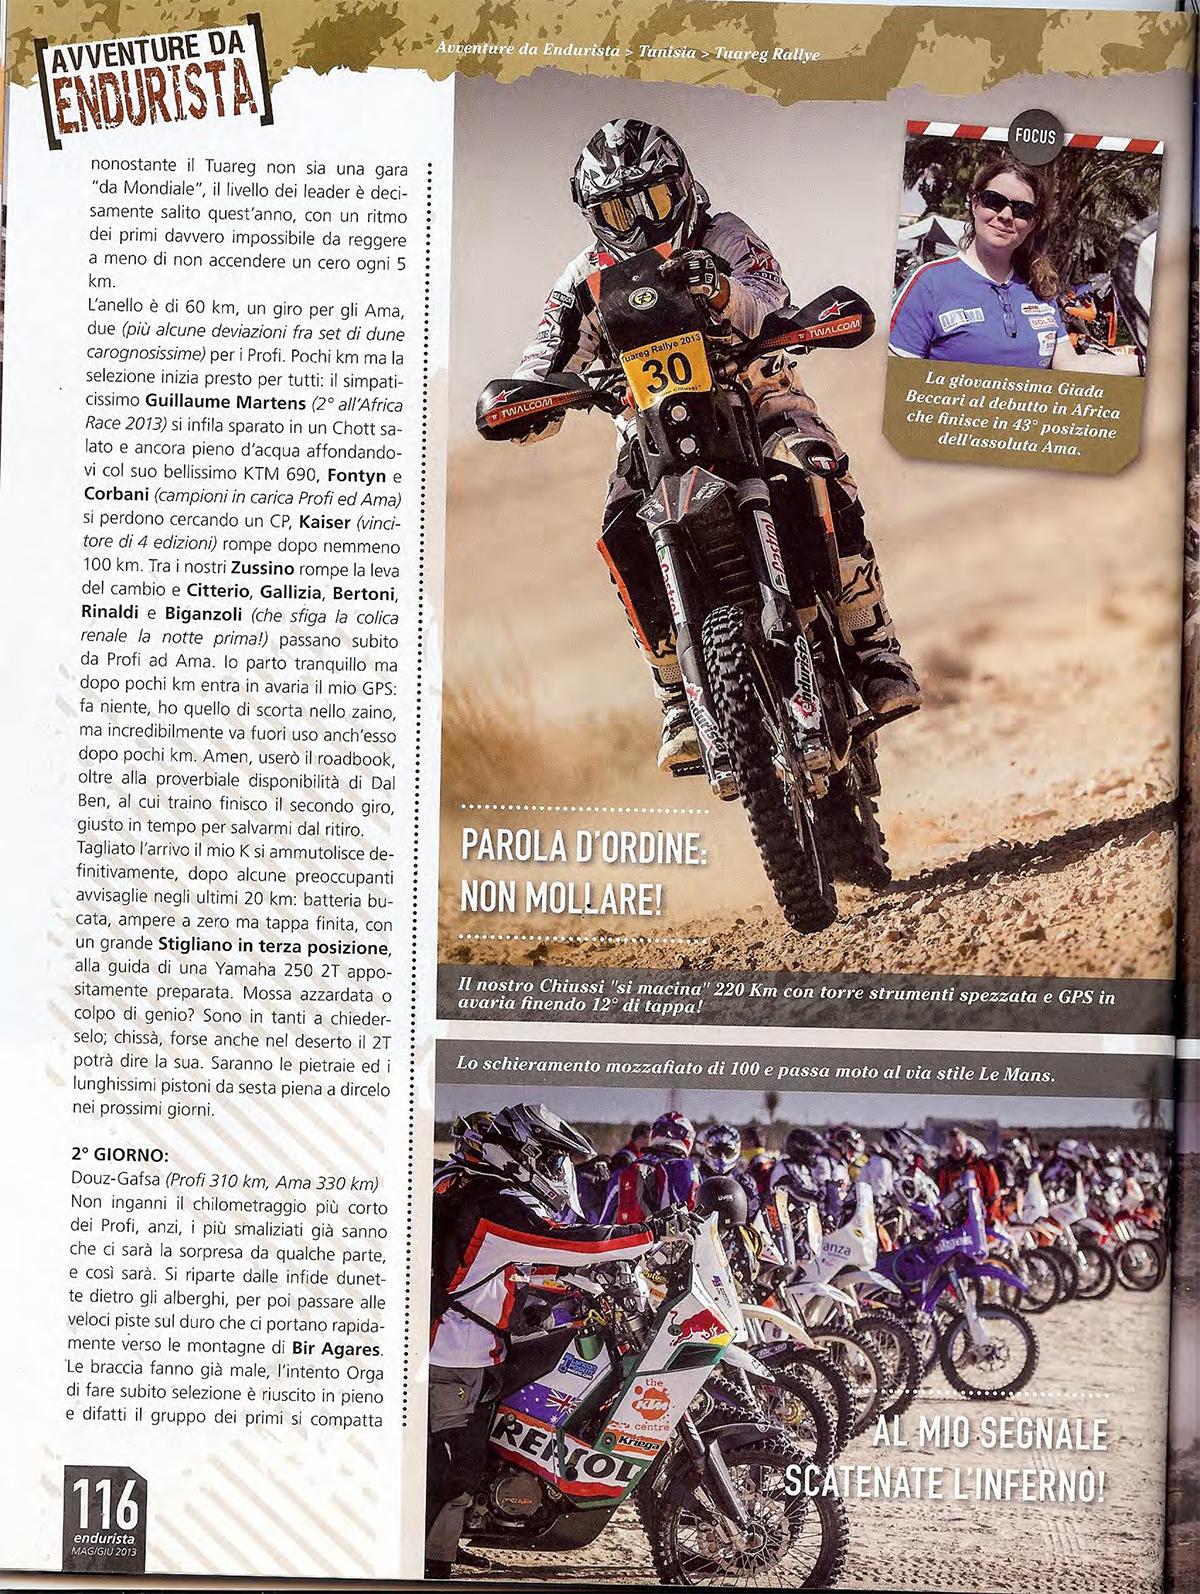 endurista magazine 4